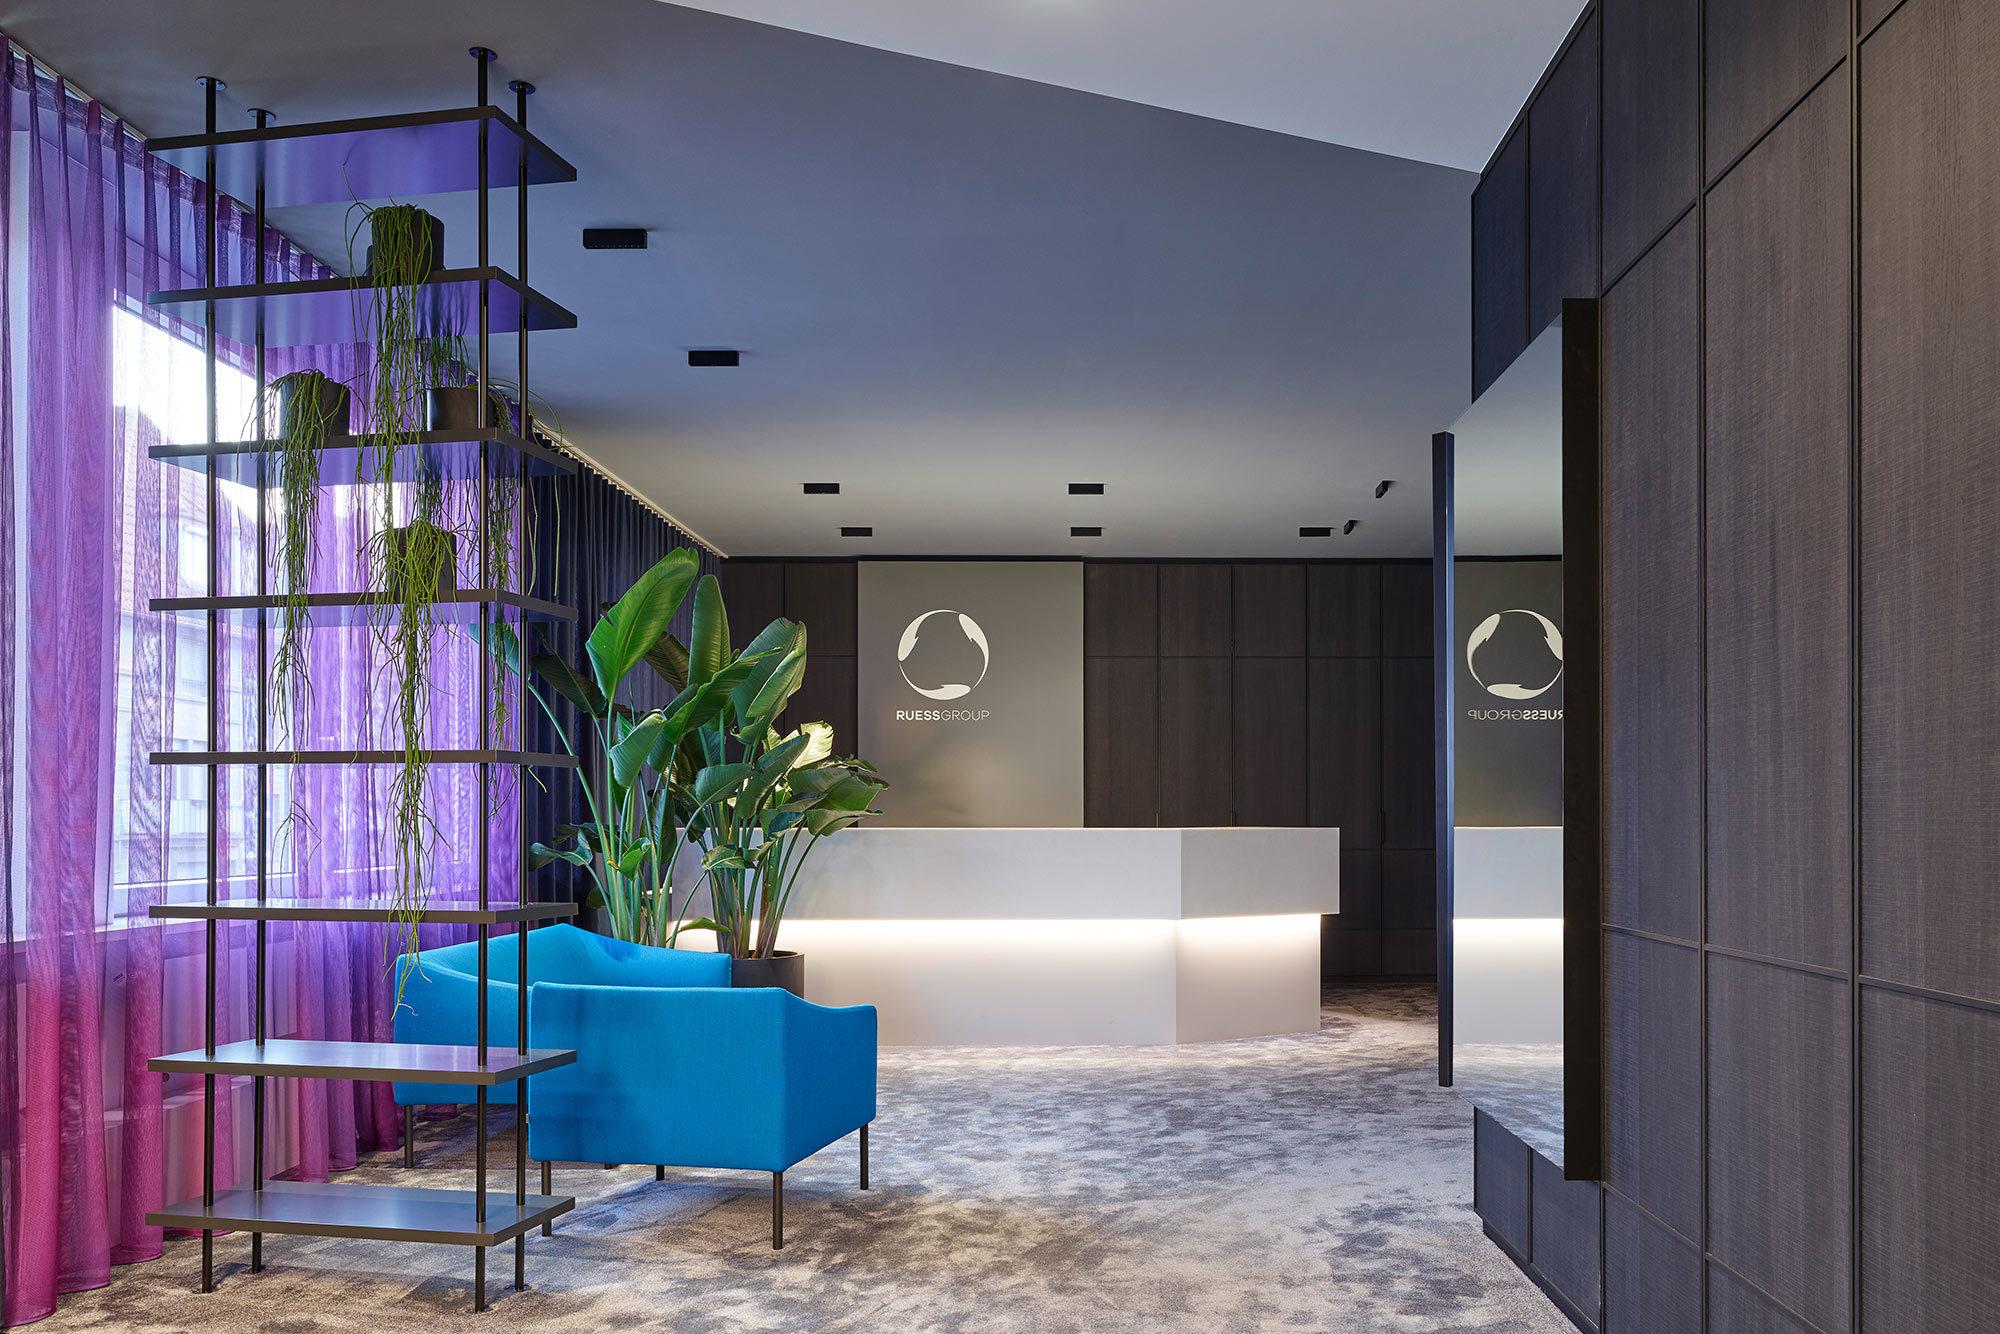 Arbeitswelt – Office Design Ruess Group, Stuttgart, Foto: Zooey Braun